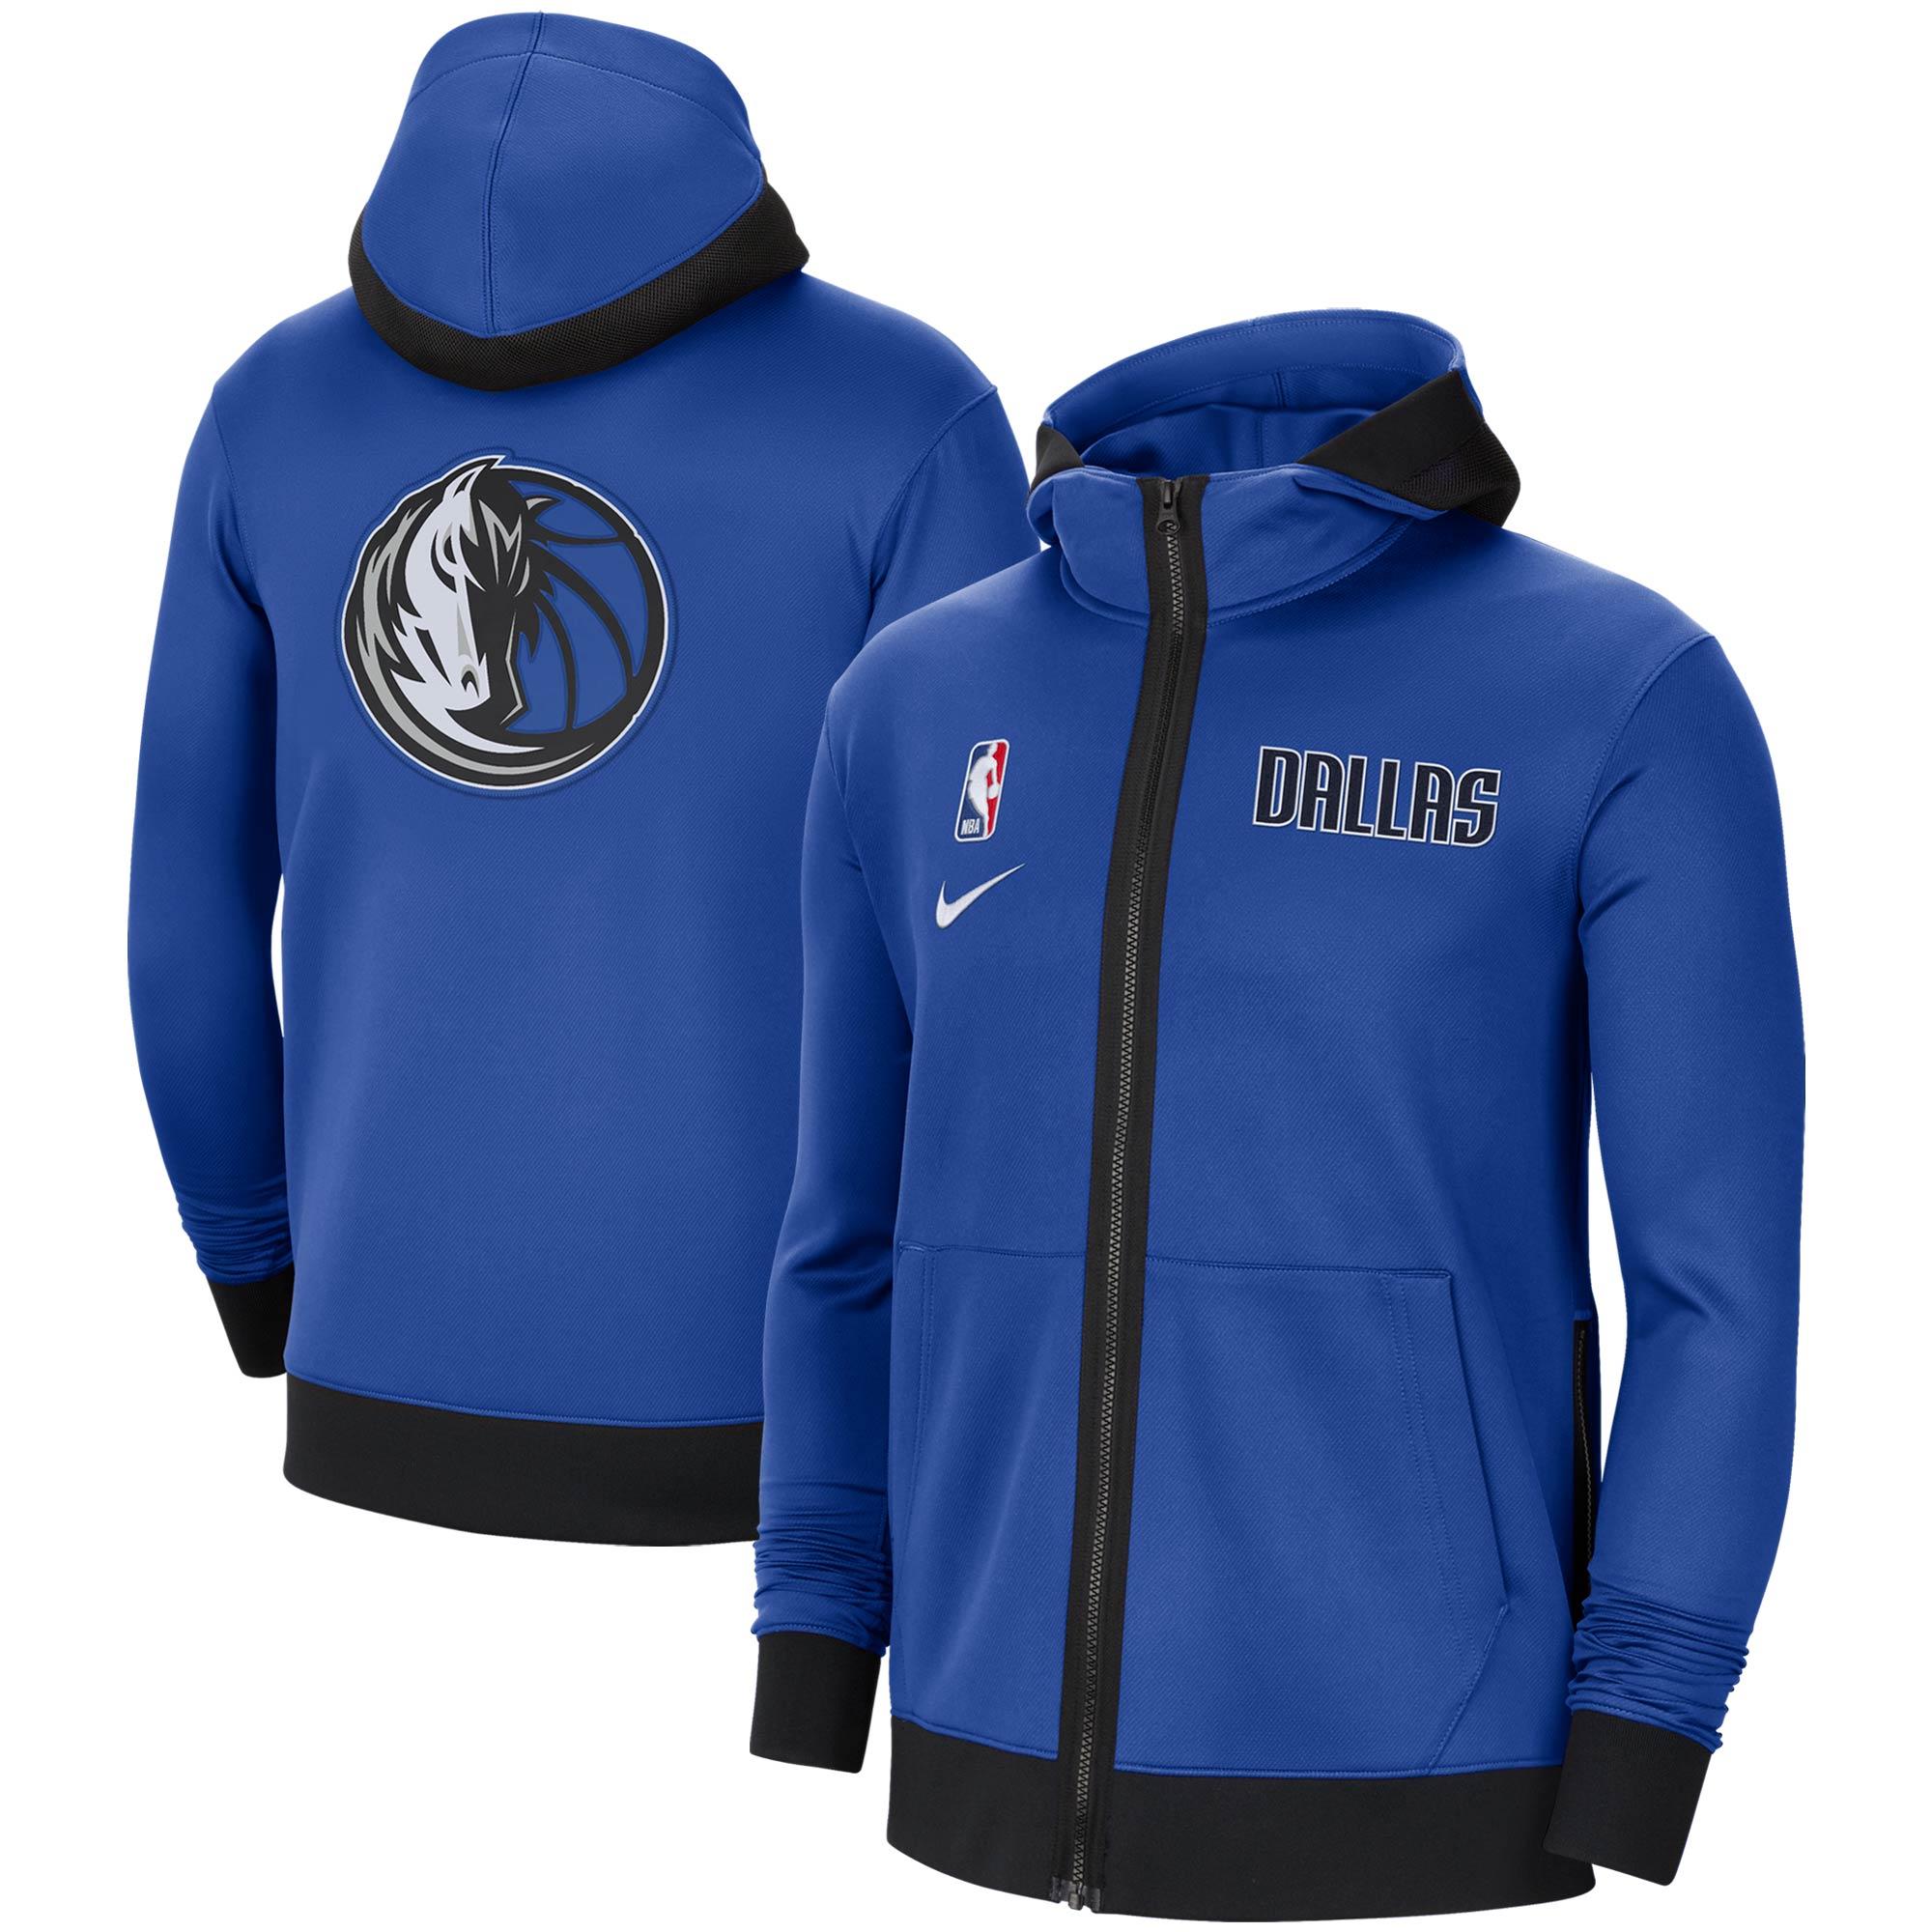 Dallas Mavericks Nike Authentic Showtime Performance Full-Zip Hoodie Jacket - Blue